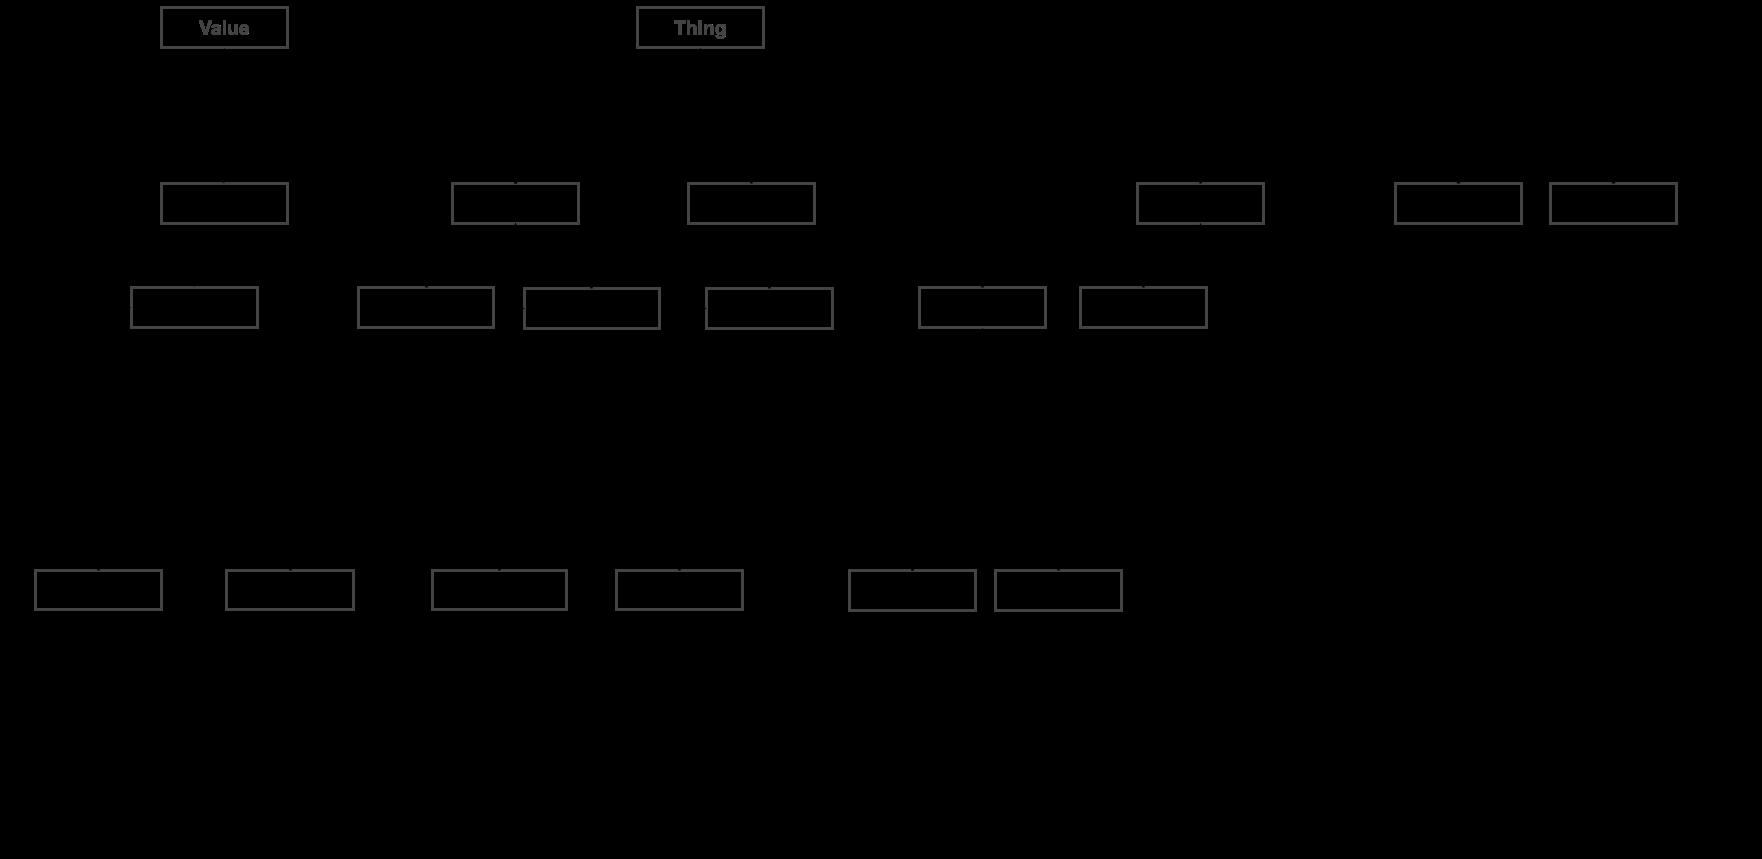 The Thing schema